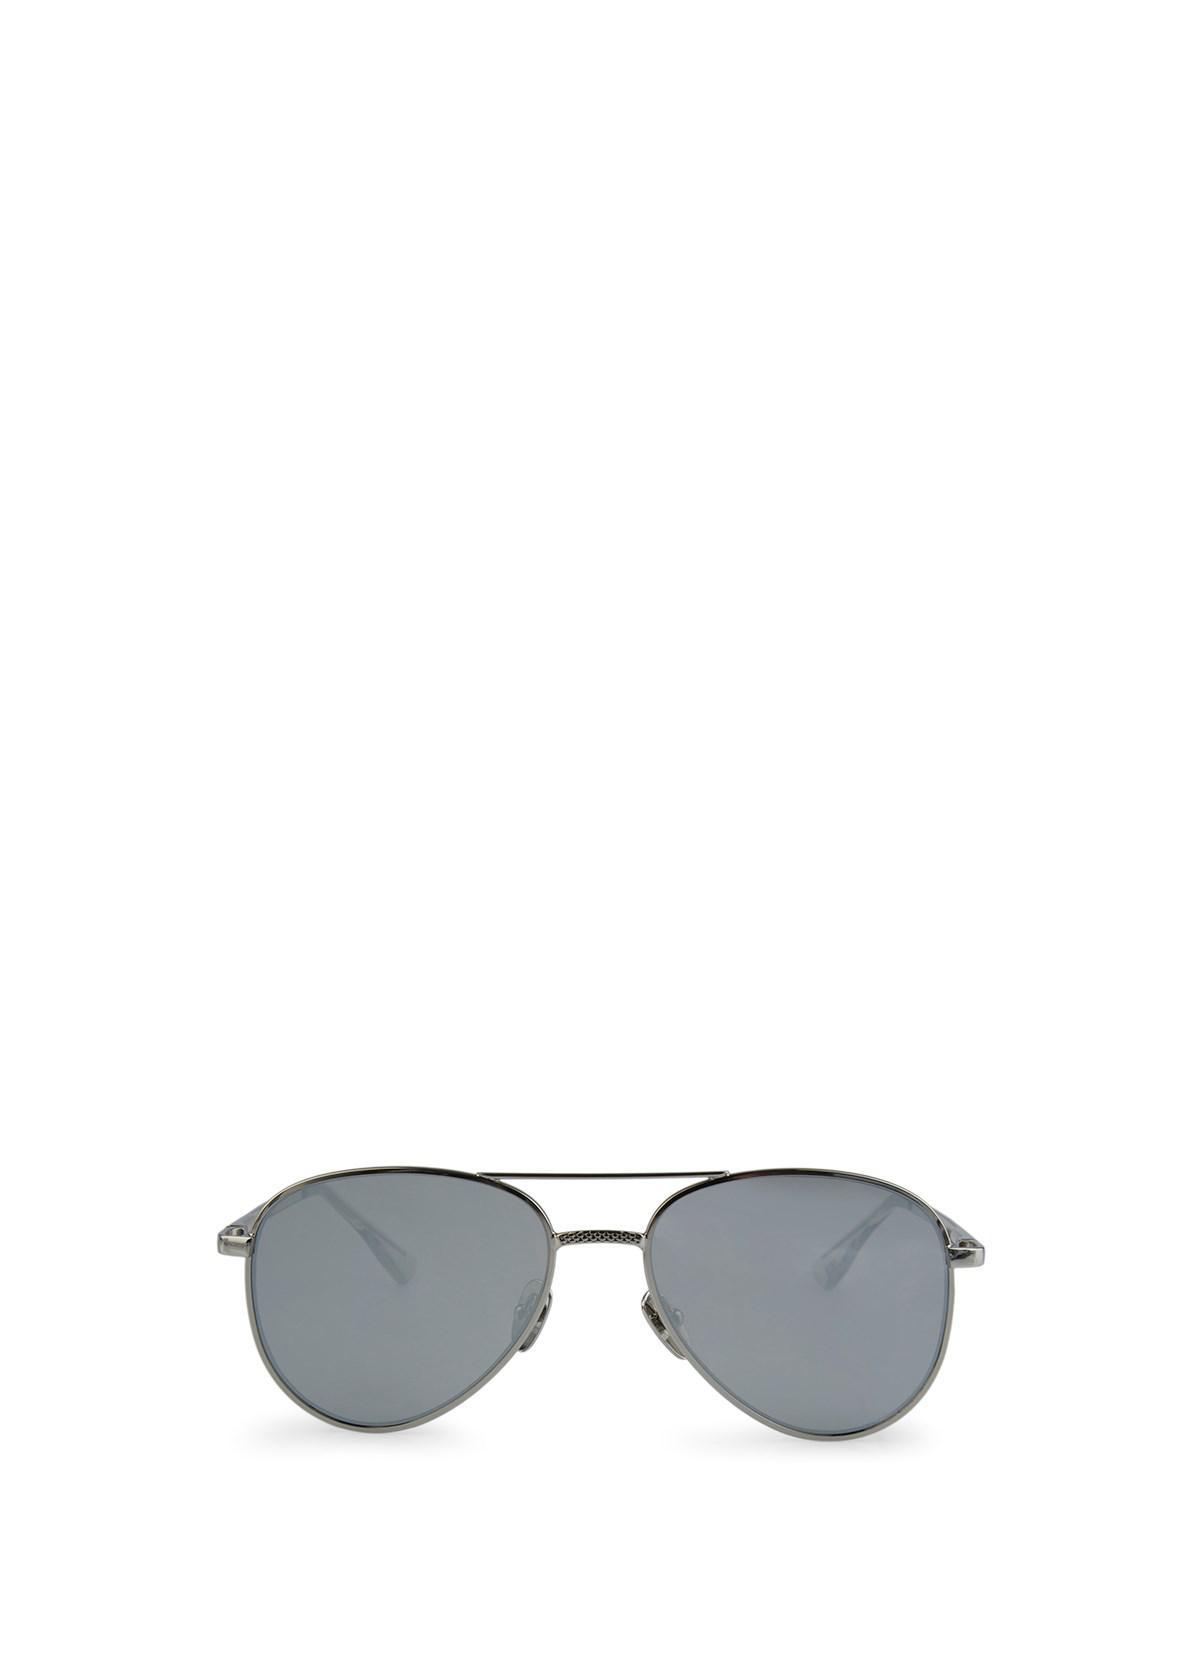 d4af2e53b Le Specs Luxe Imperium, Platinum Sunglasses in White - Lyst